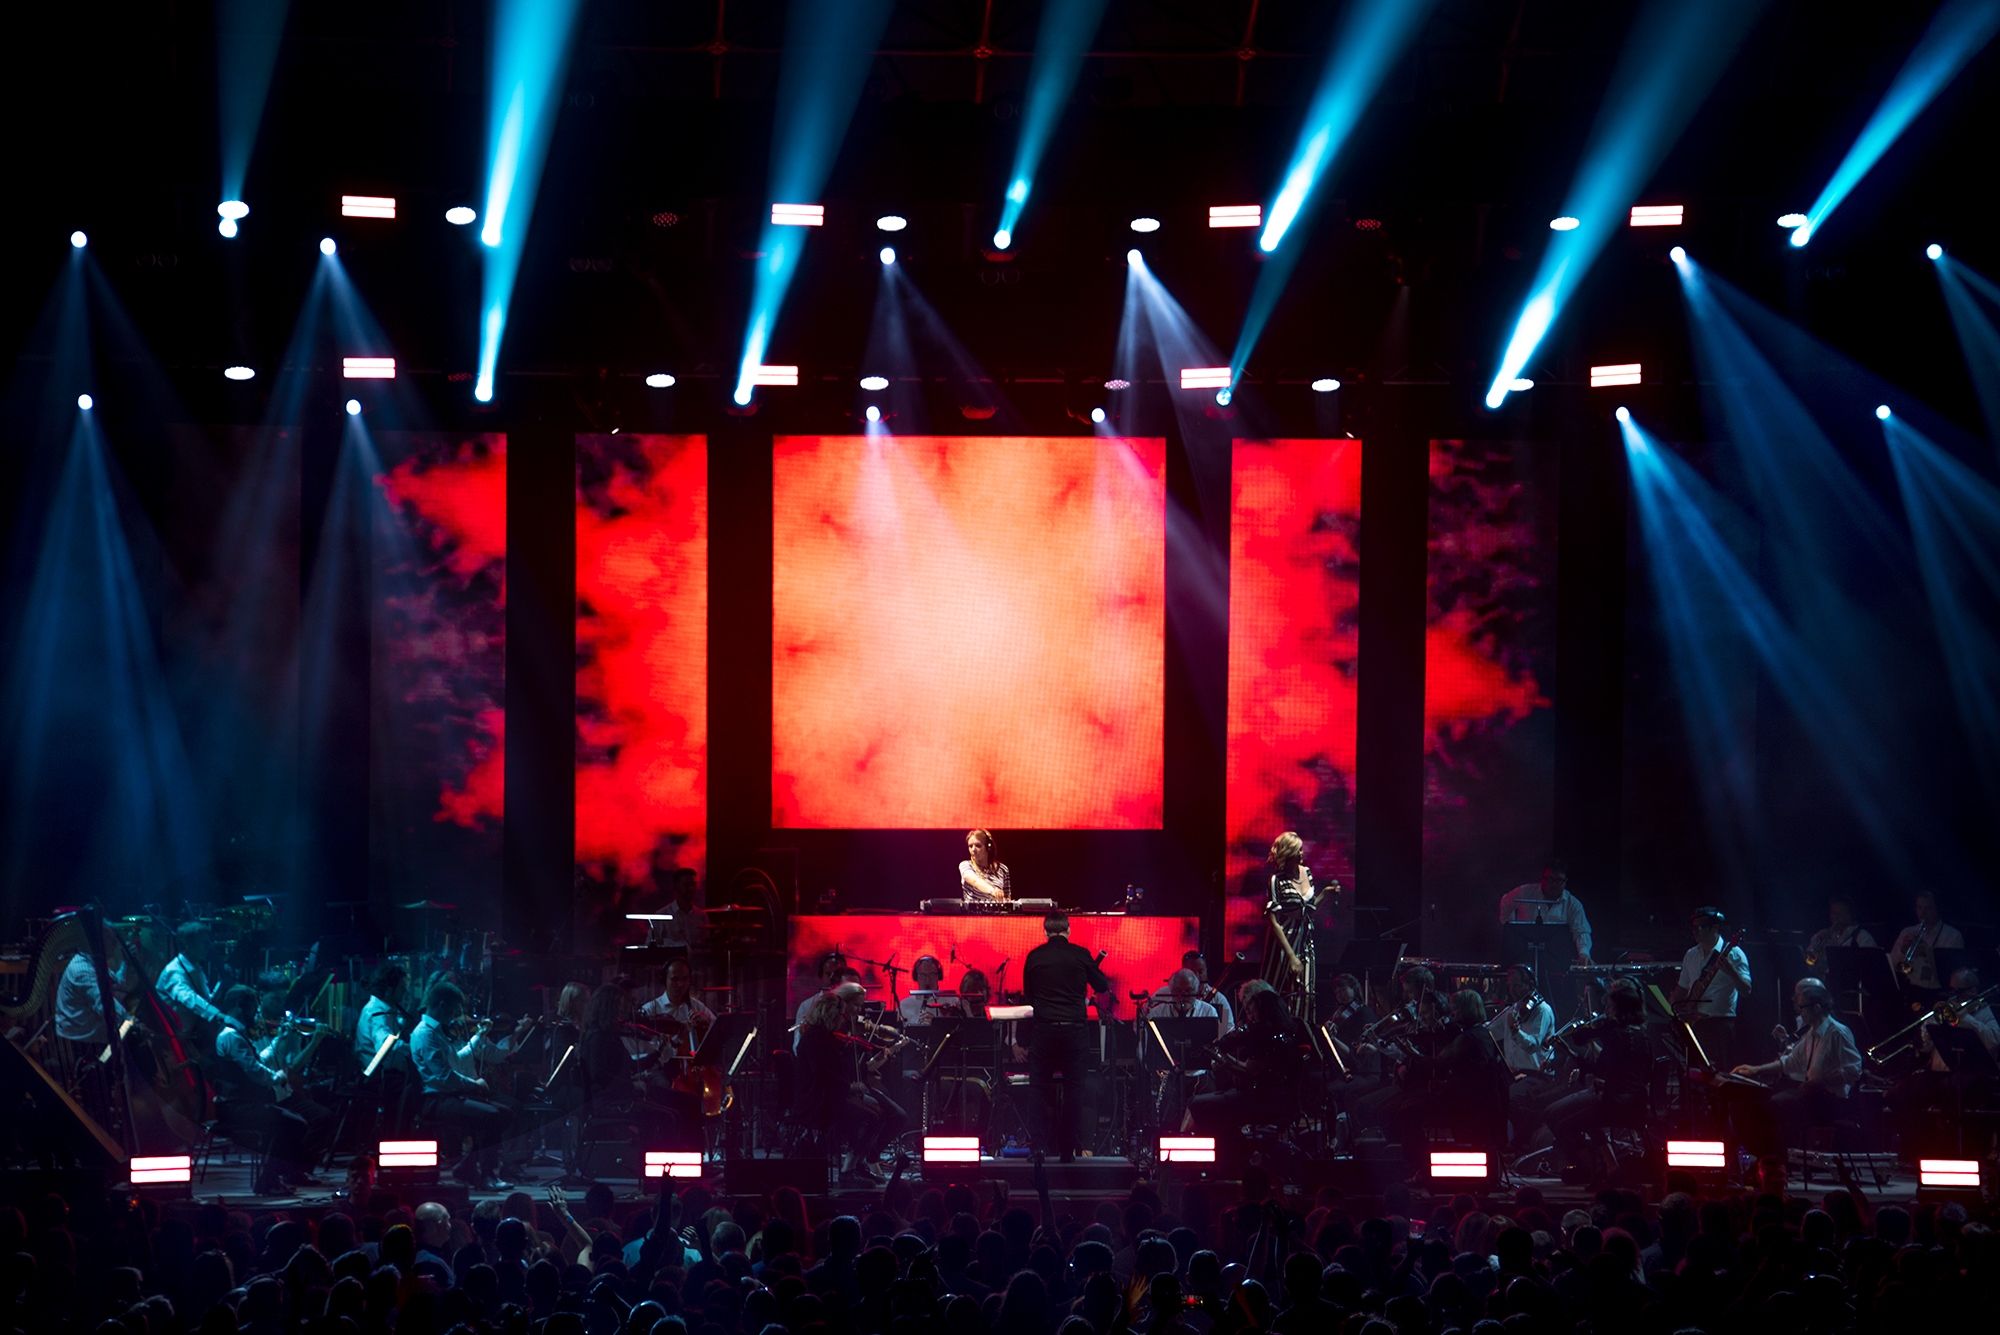 Cover image: 2FM Live & RTE Concert Orchestra